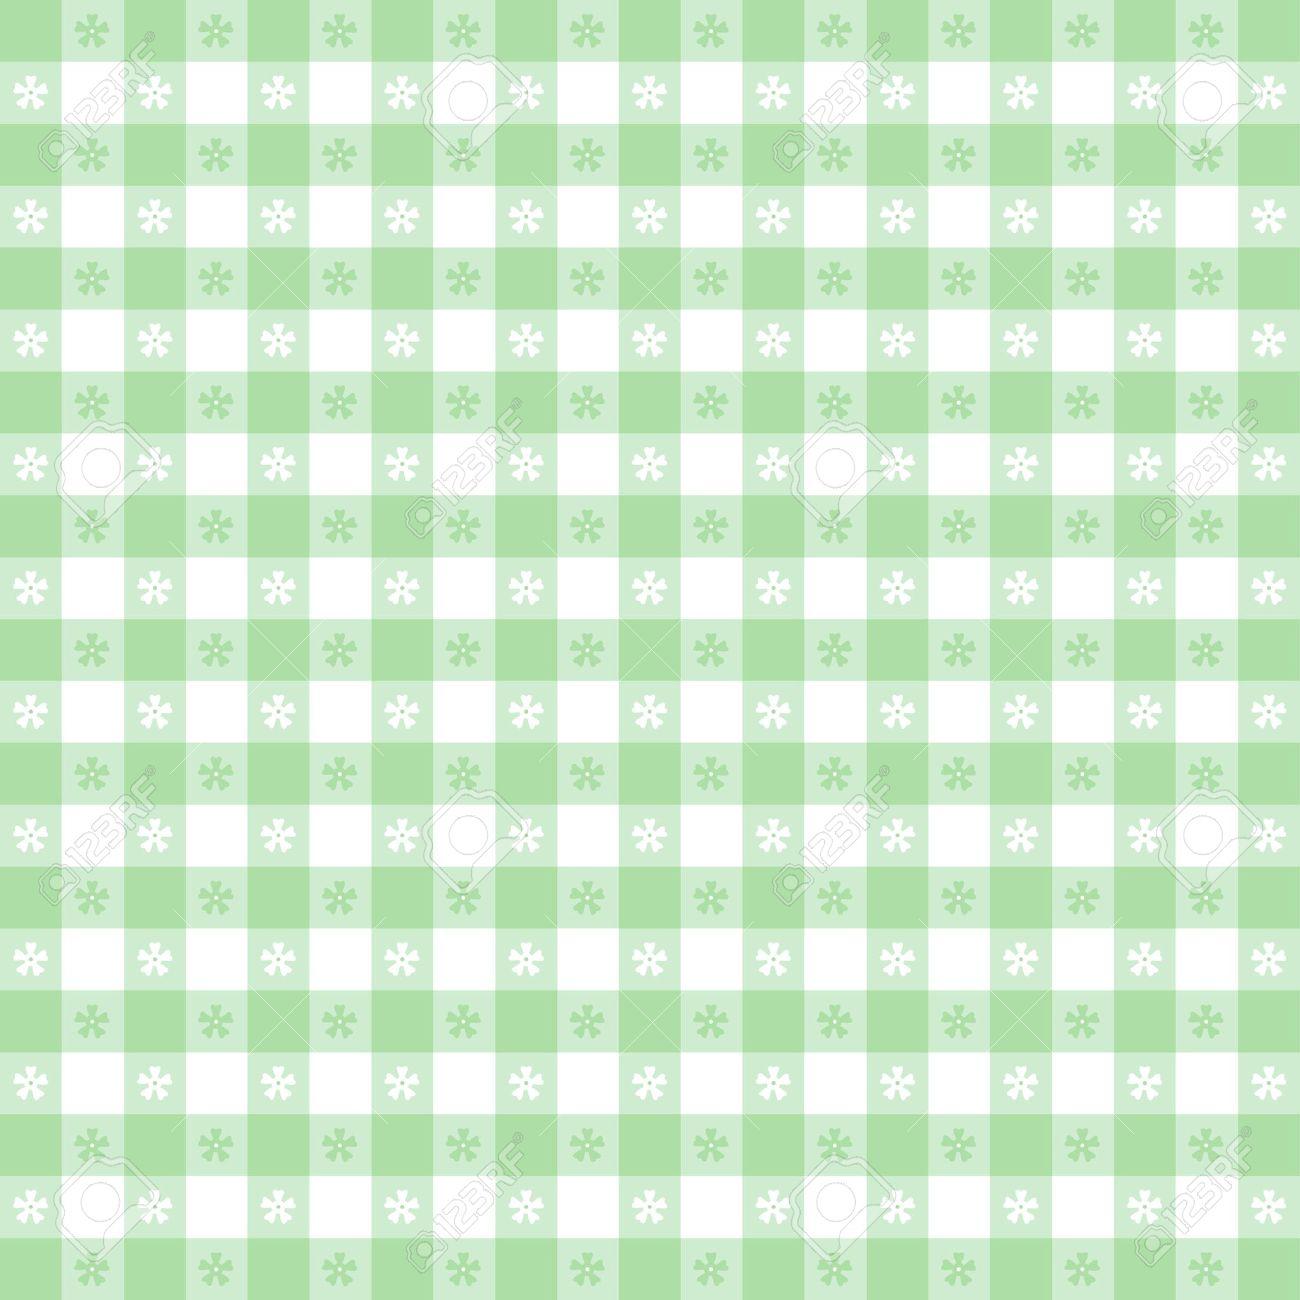 pastel green grid pattern